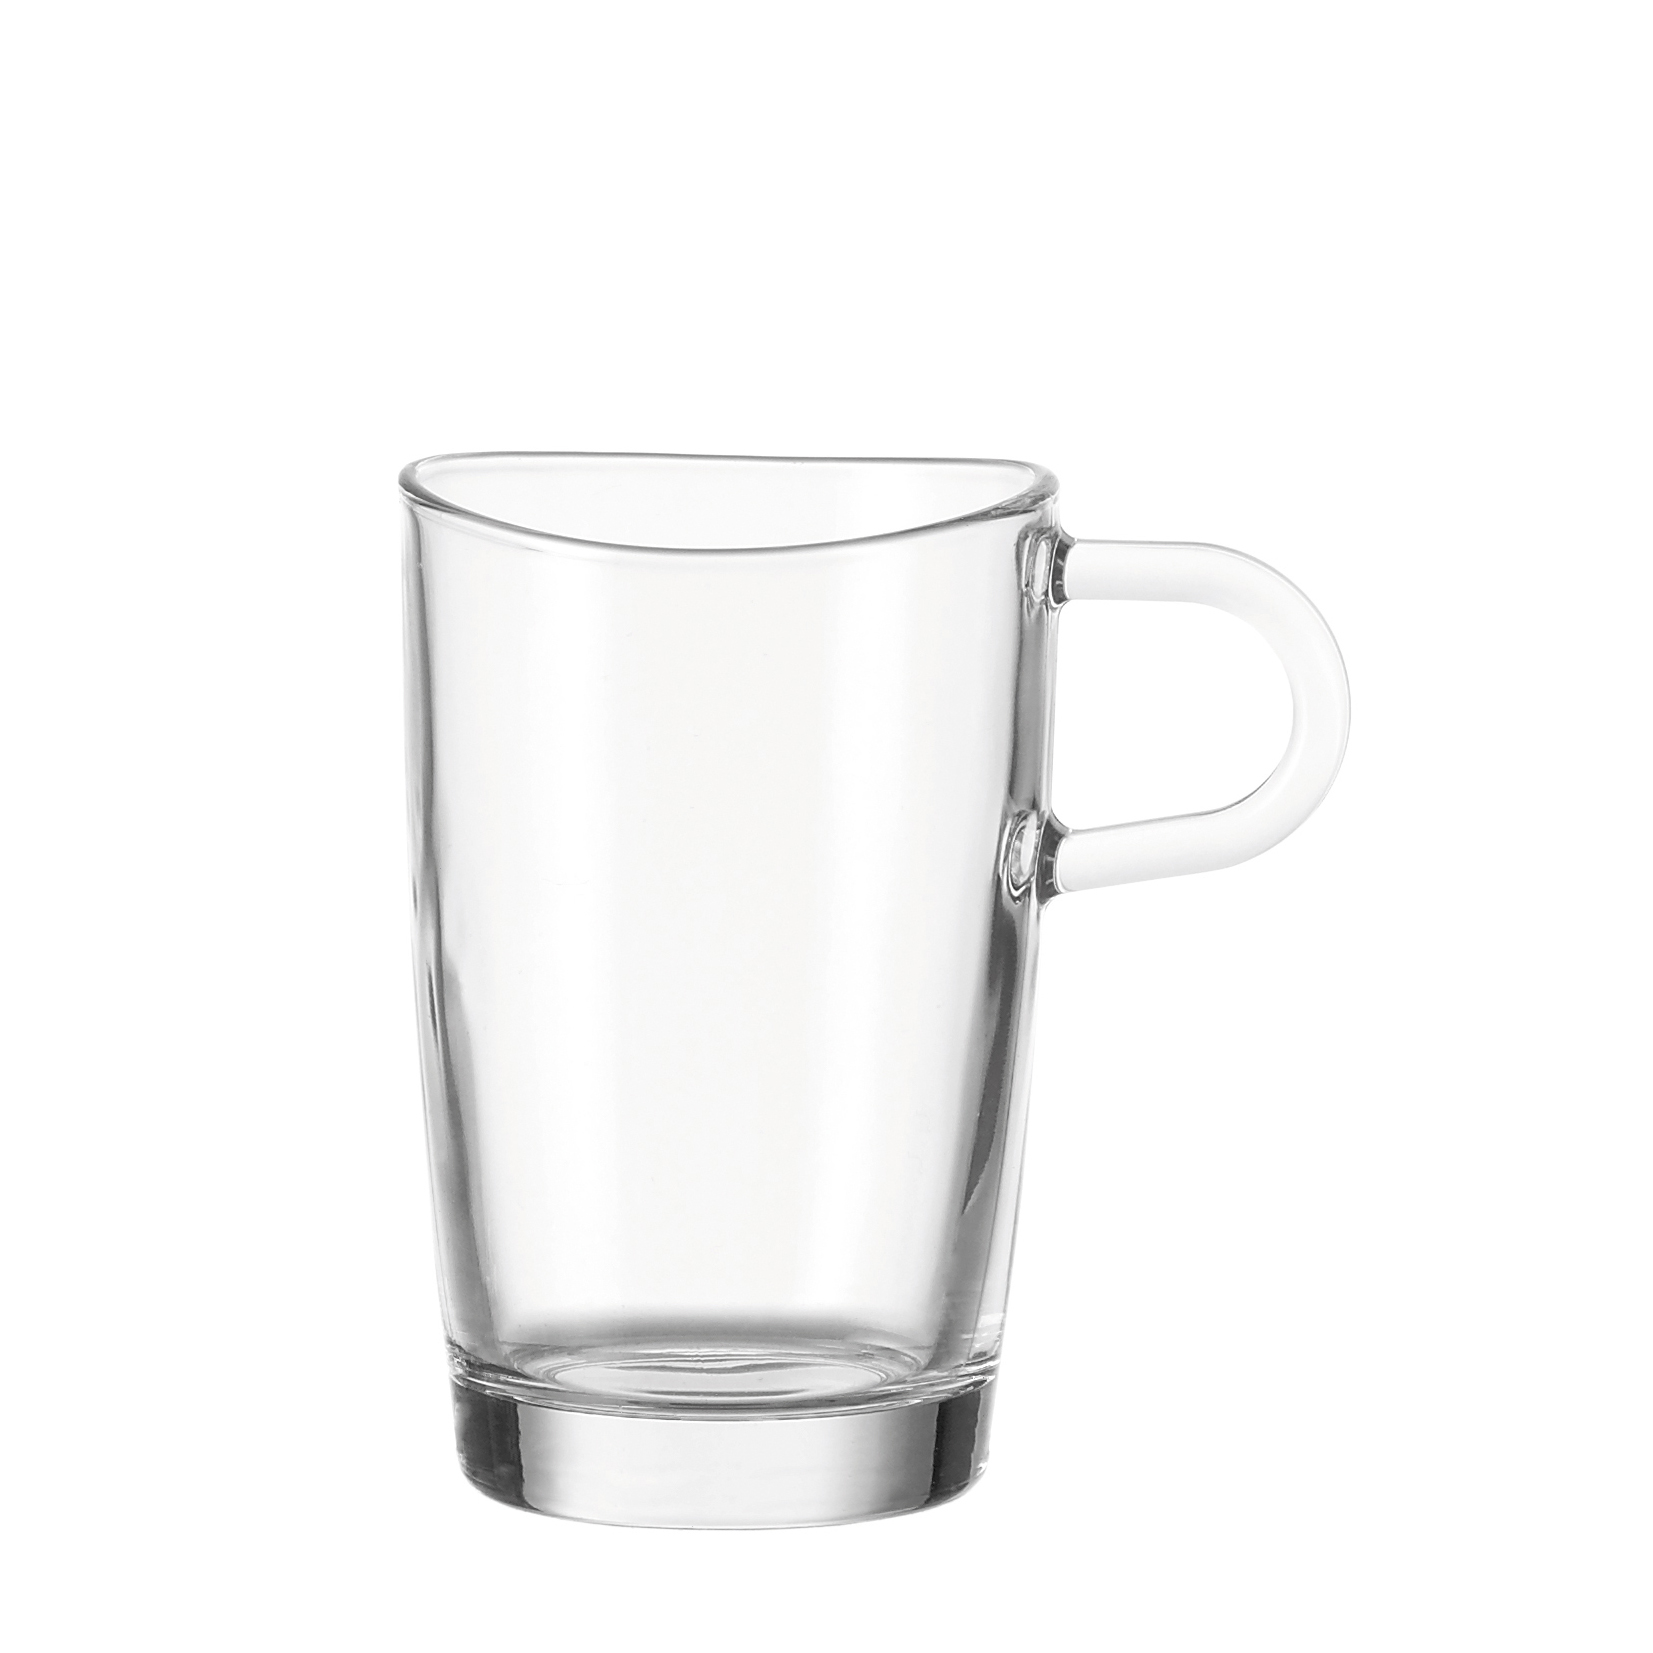 leonardo loop becher set 6 teilig latte macchiato glas neu ebay. Black Bedroom Furniture Sets. Home Design Ideas